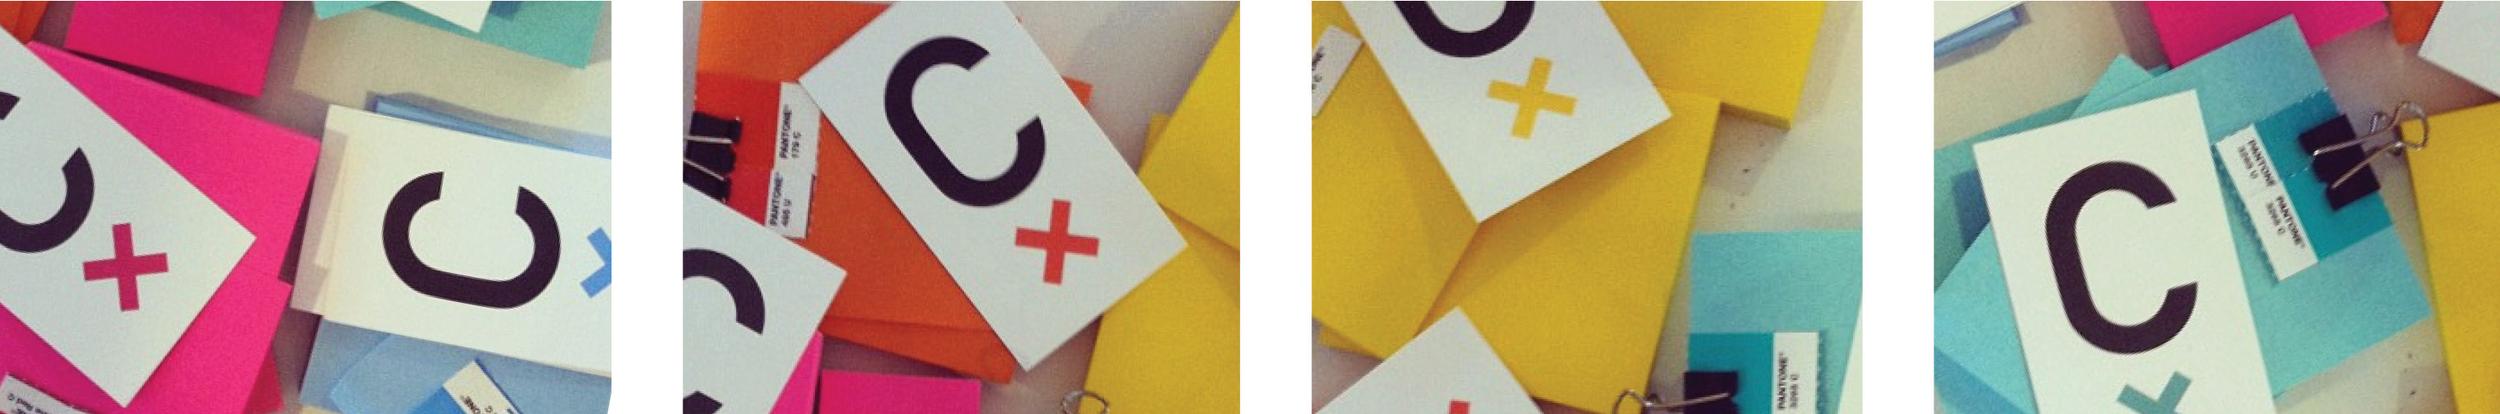 crackcards.jpg